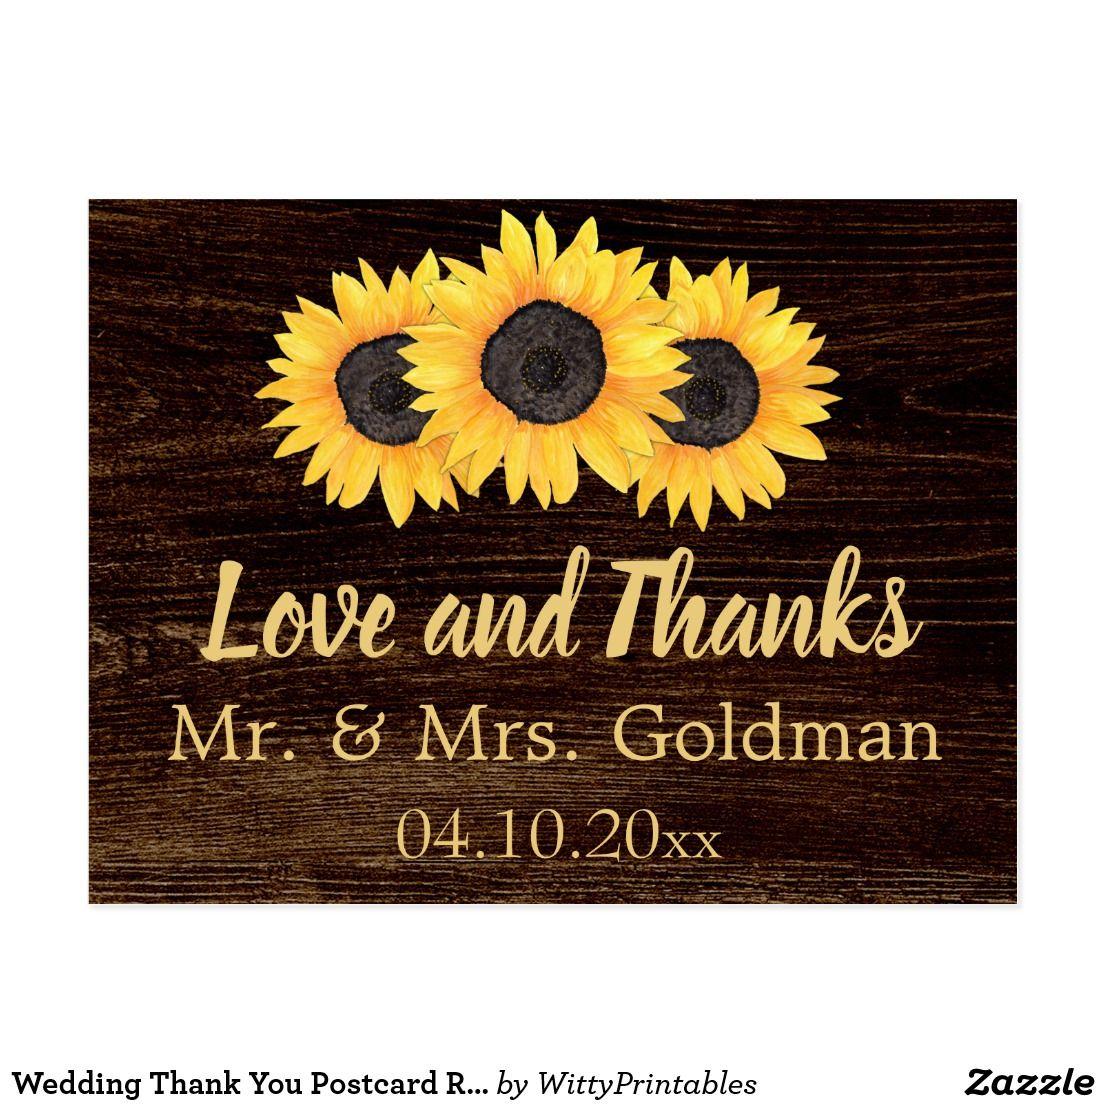 sunflower wedding invitations printable%0A Wedding Thank You Postcard Rustic Sunflowers Wood